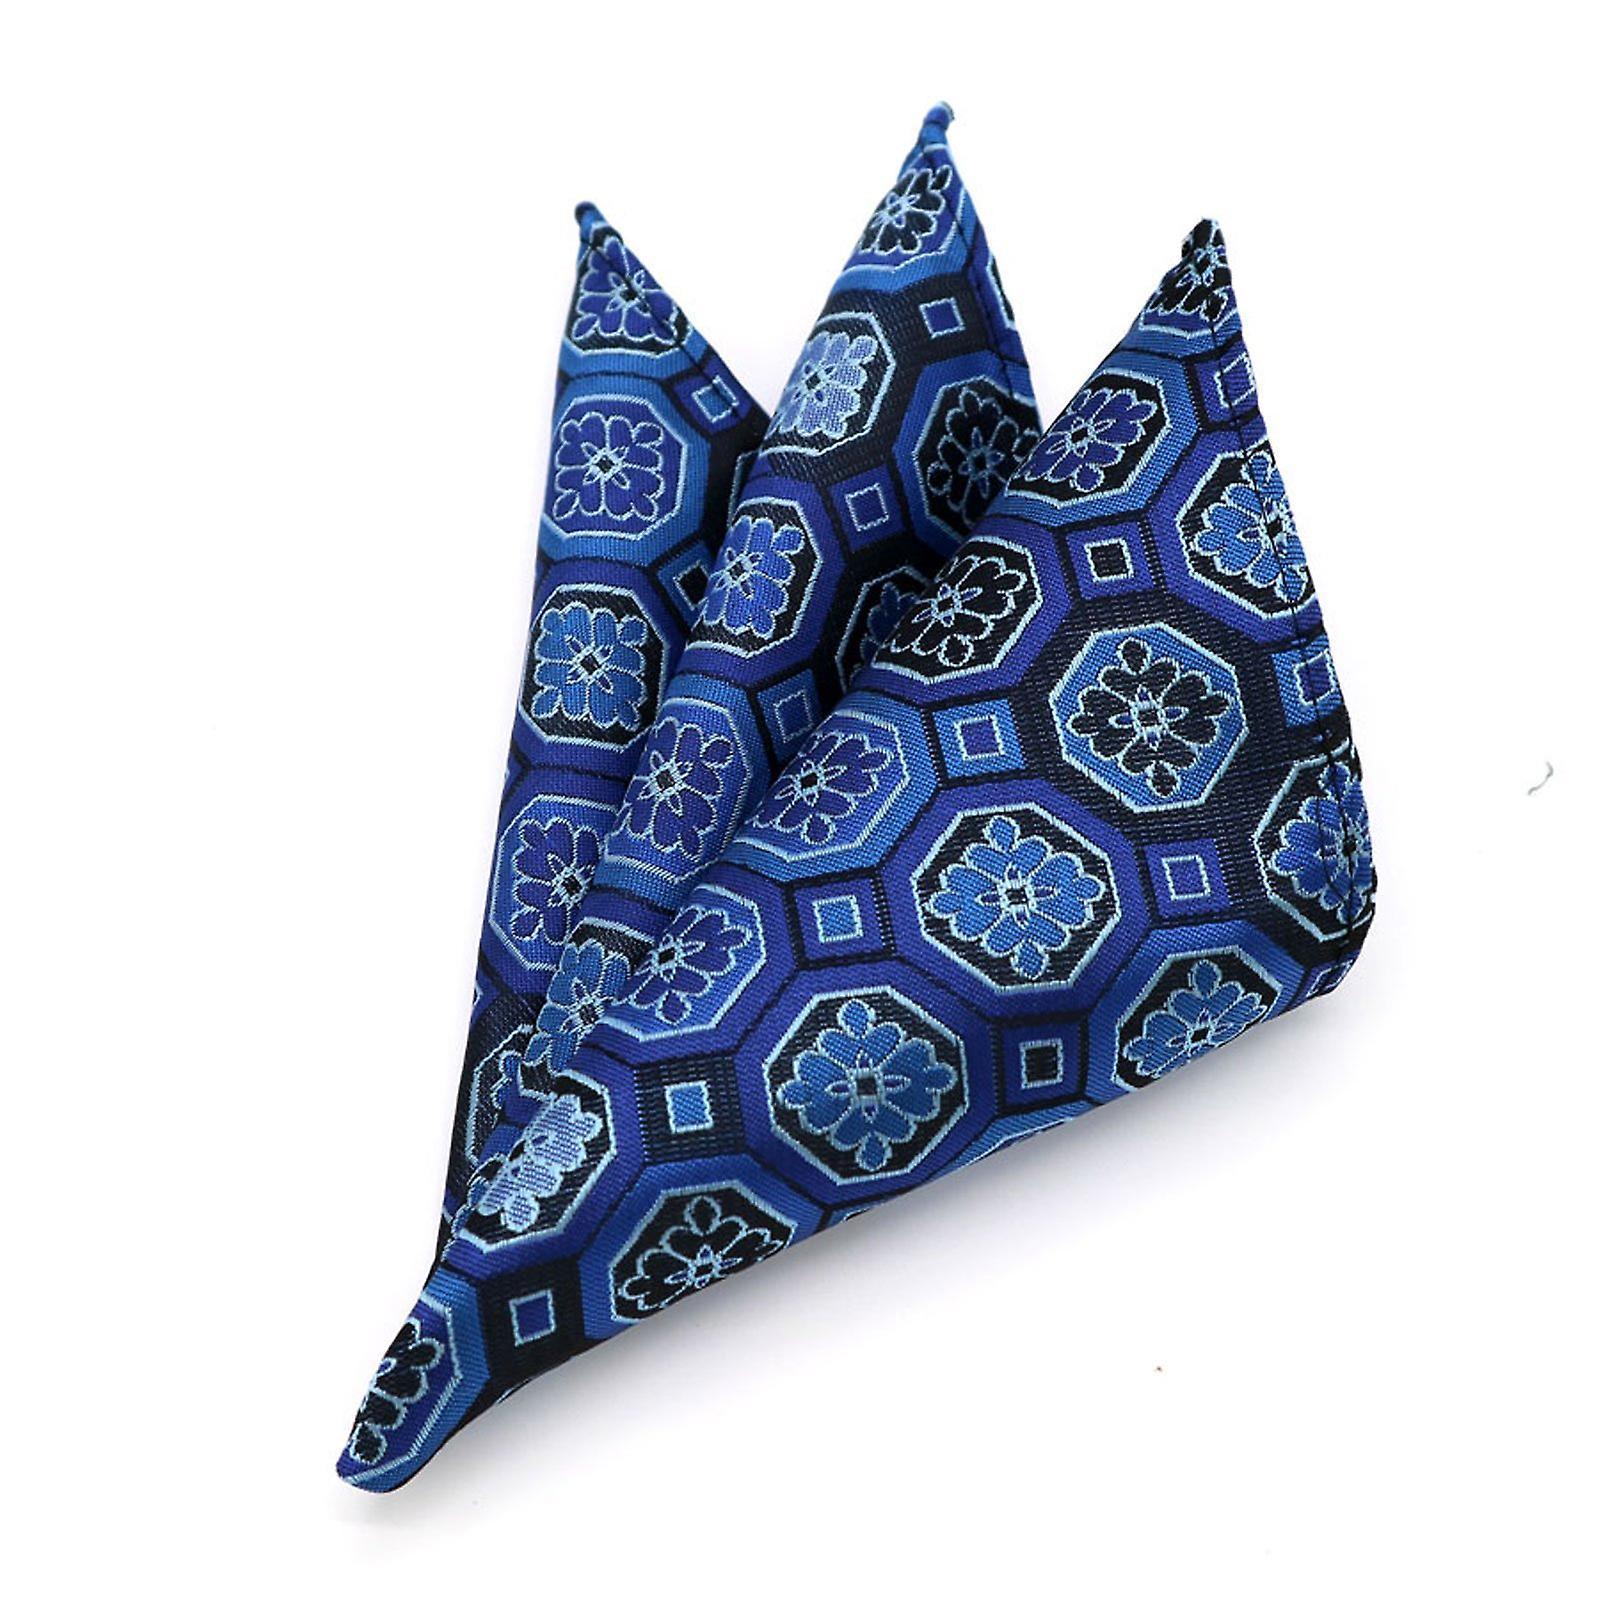 Blue geo pattern men's handkerchief pocket square